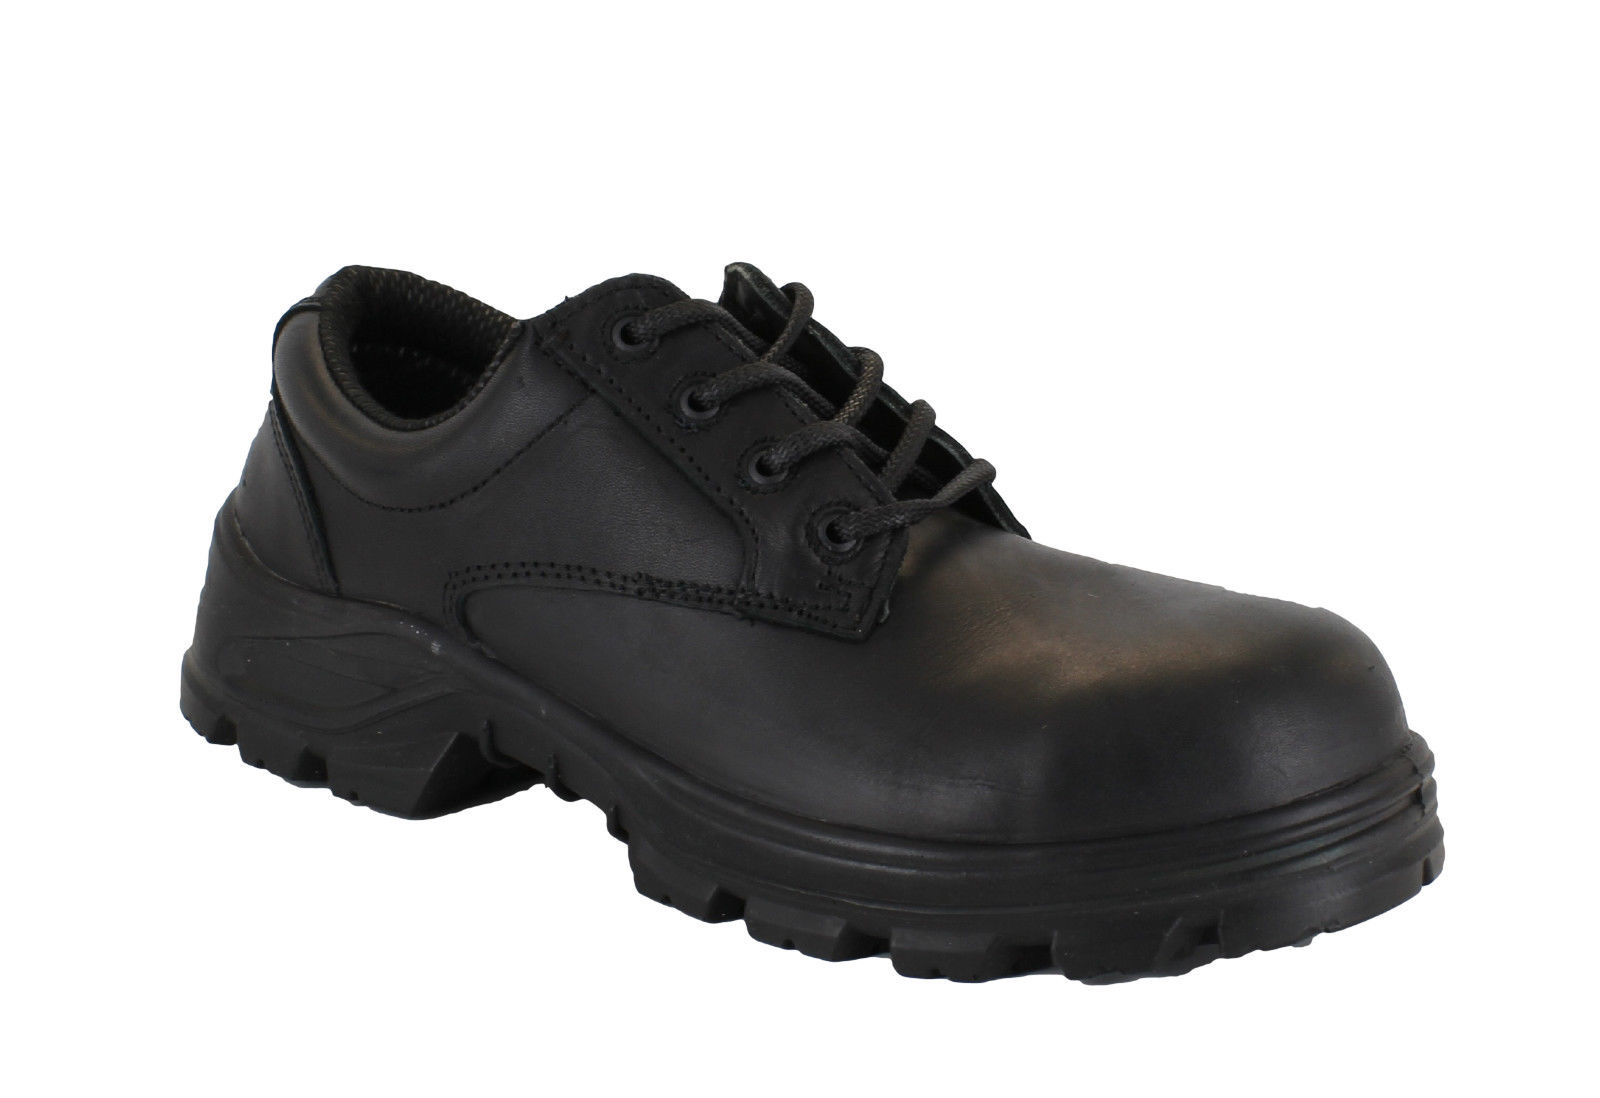 Terra Emerson S3 Mens Black Formal Smart Safety Composite Toe Shoes | EBay